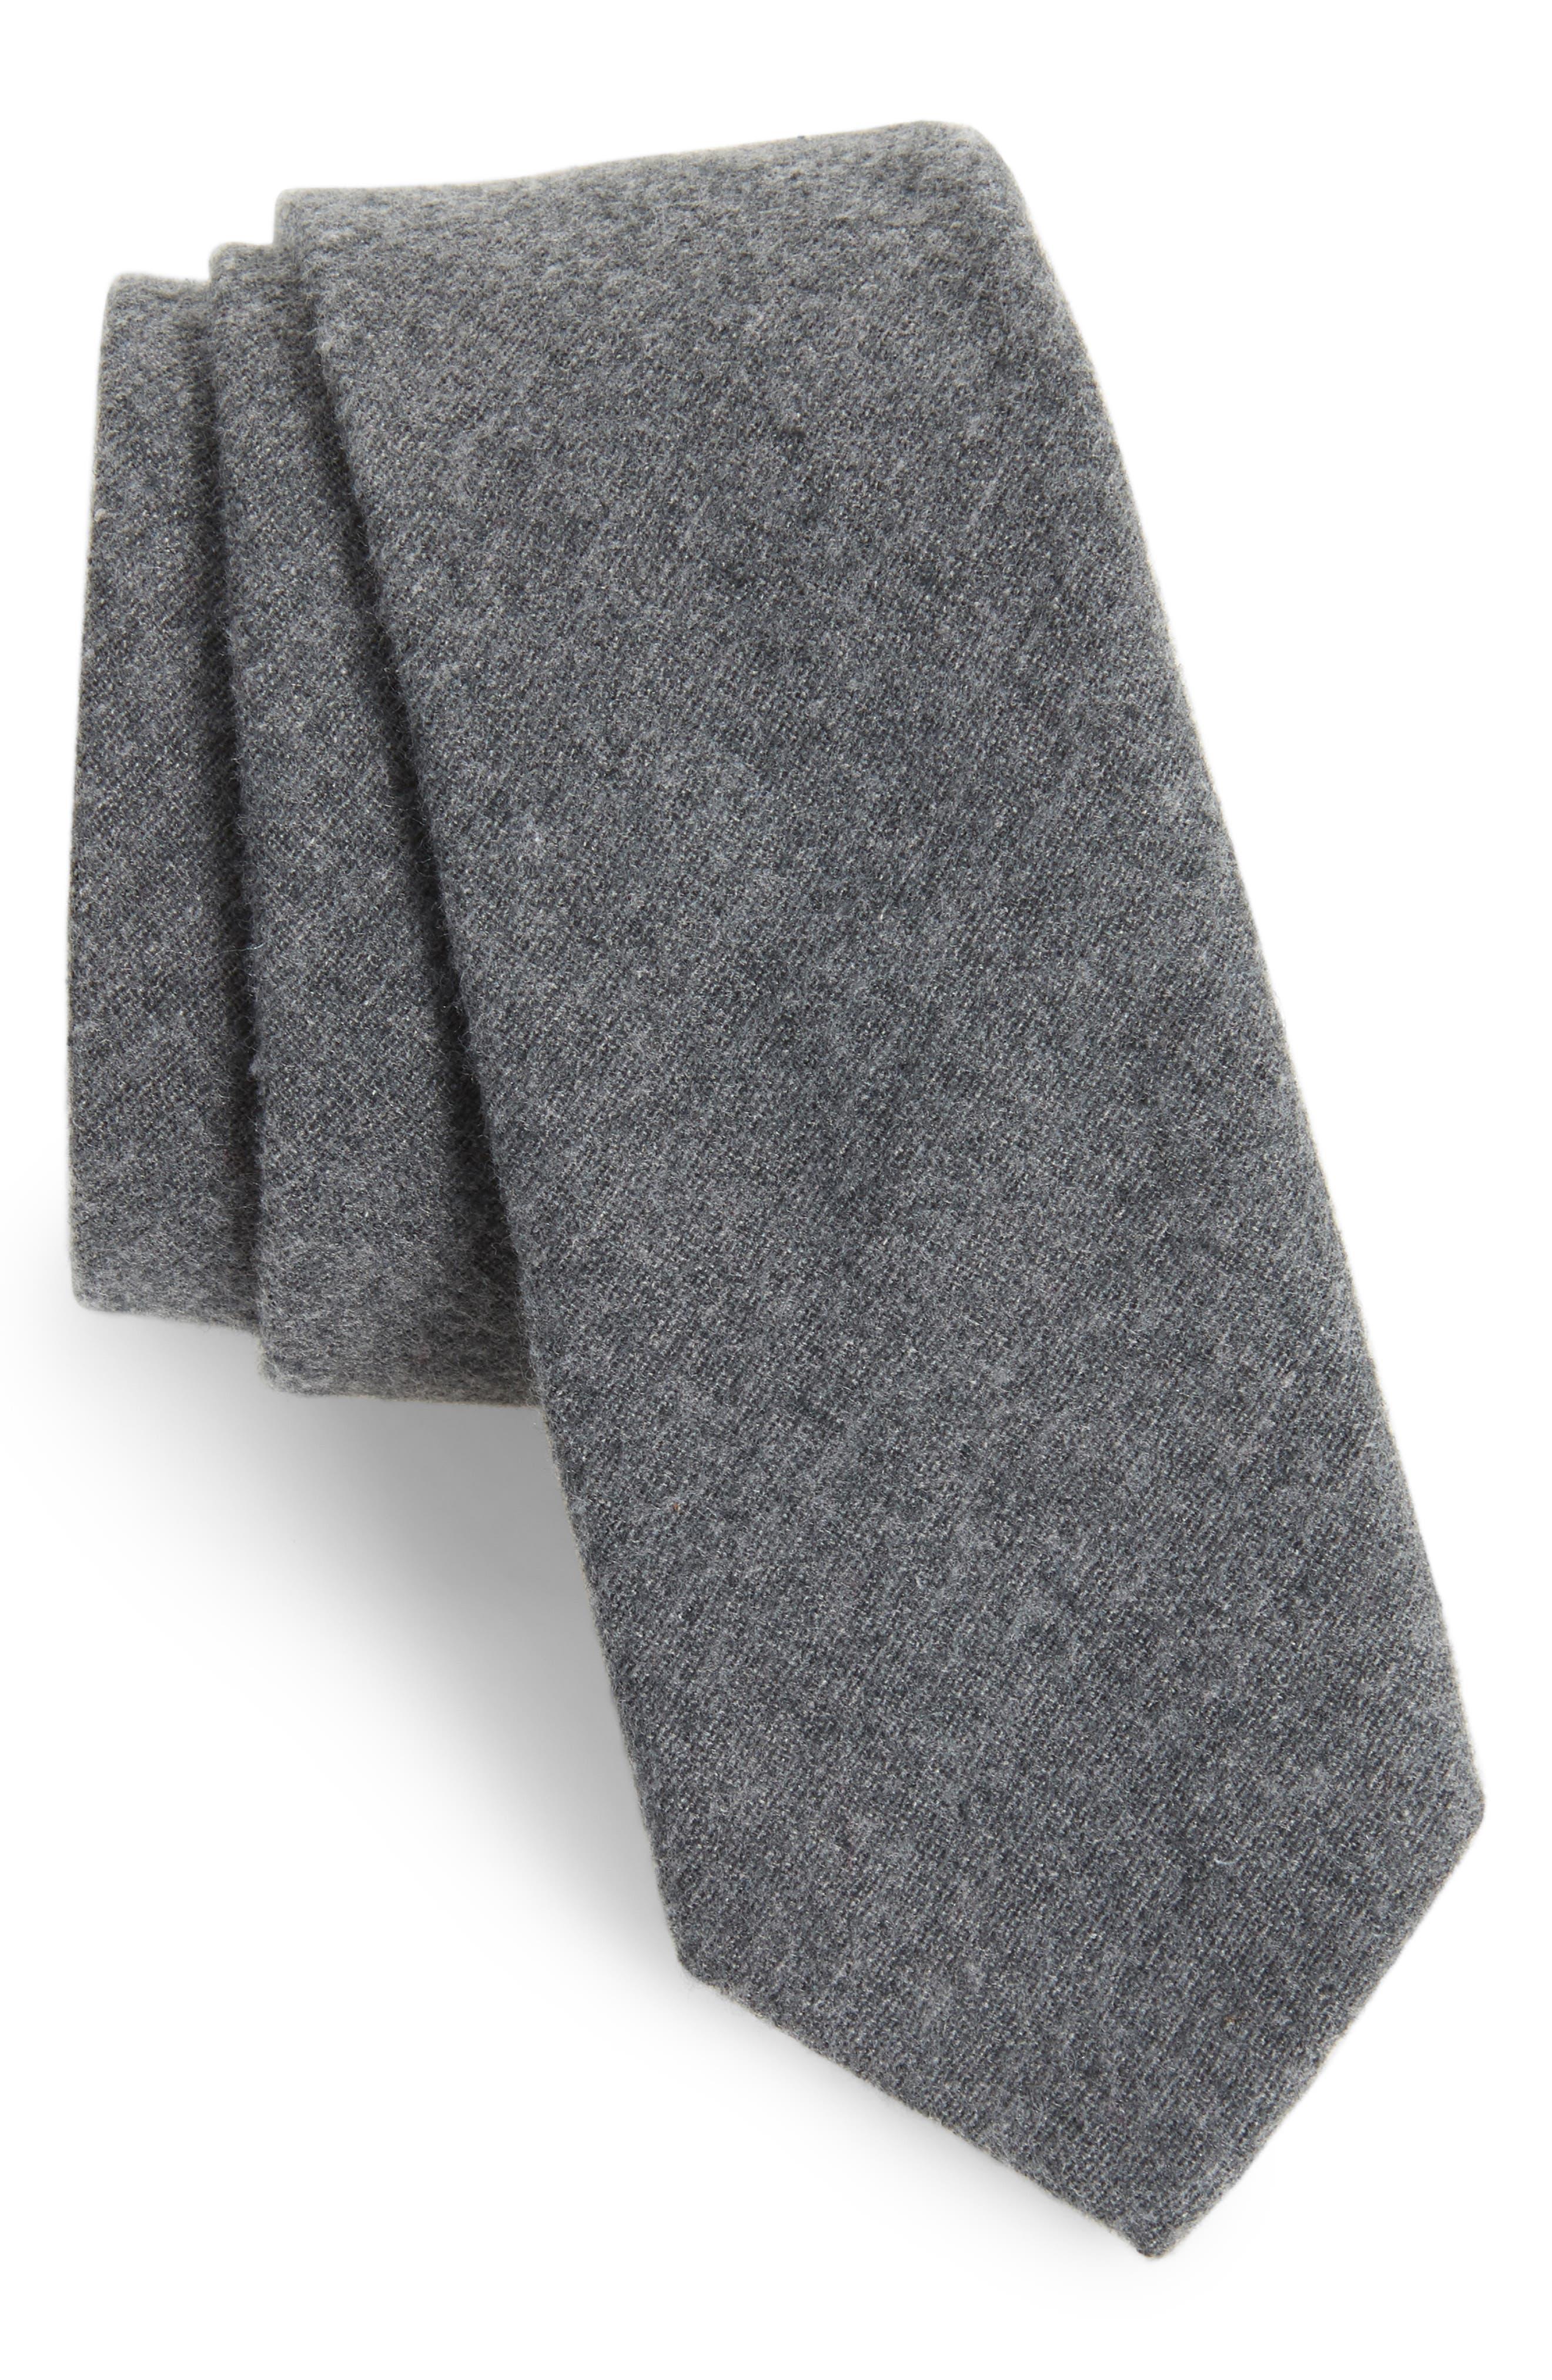 Bert Solid Cotton Skinny Tie,                             Main thumbnail 1, color,                             010